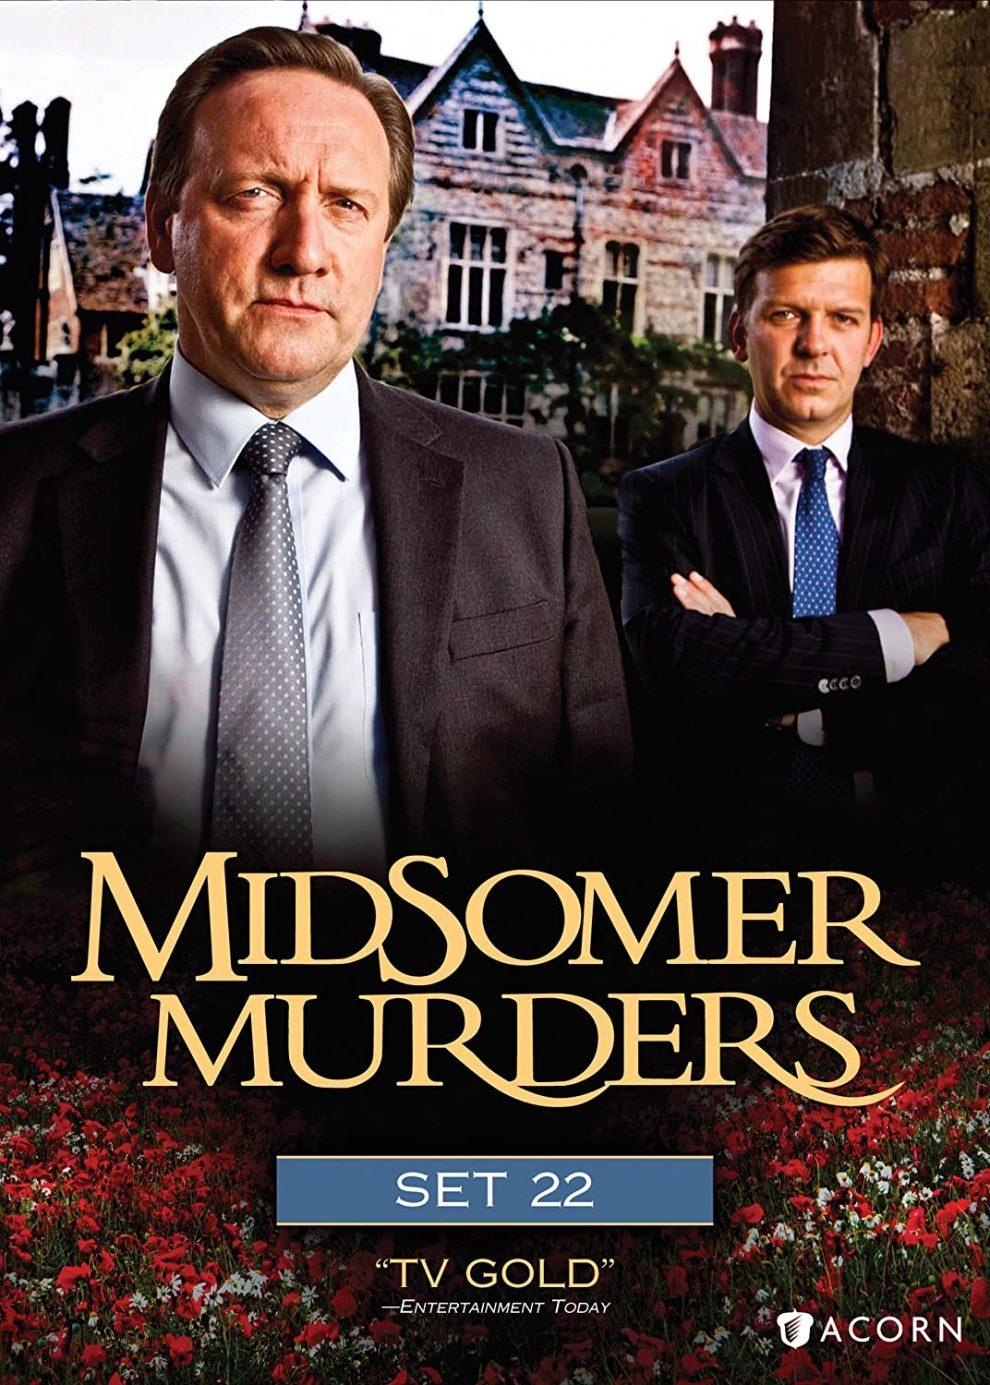 Midsomer Murders Season 22 Updates